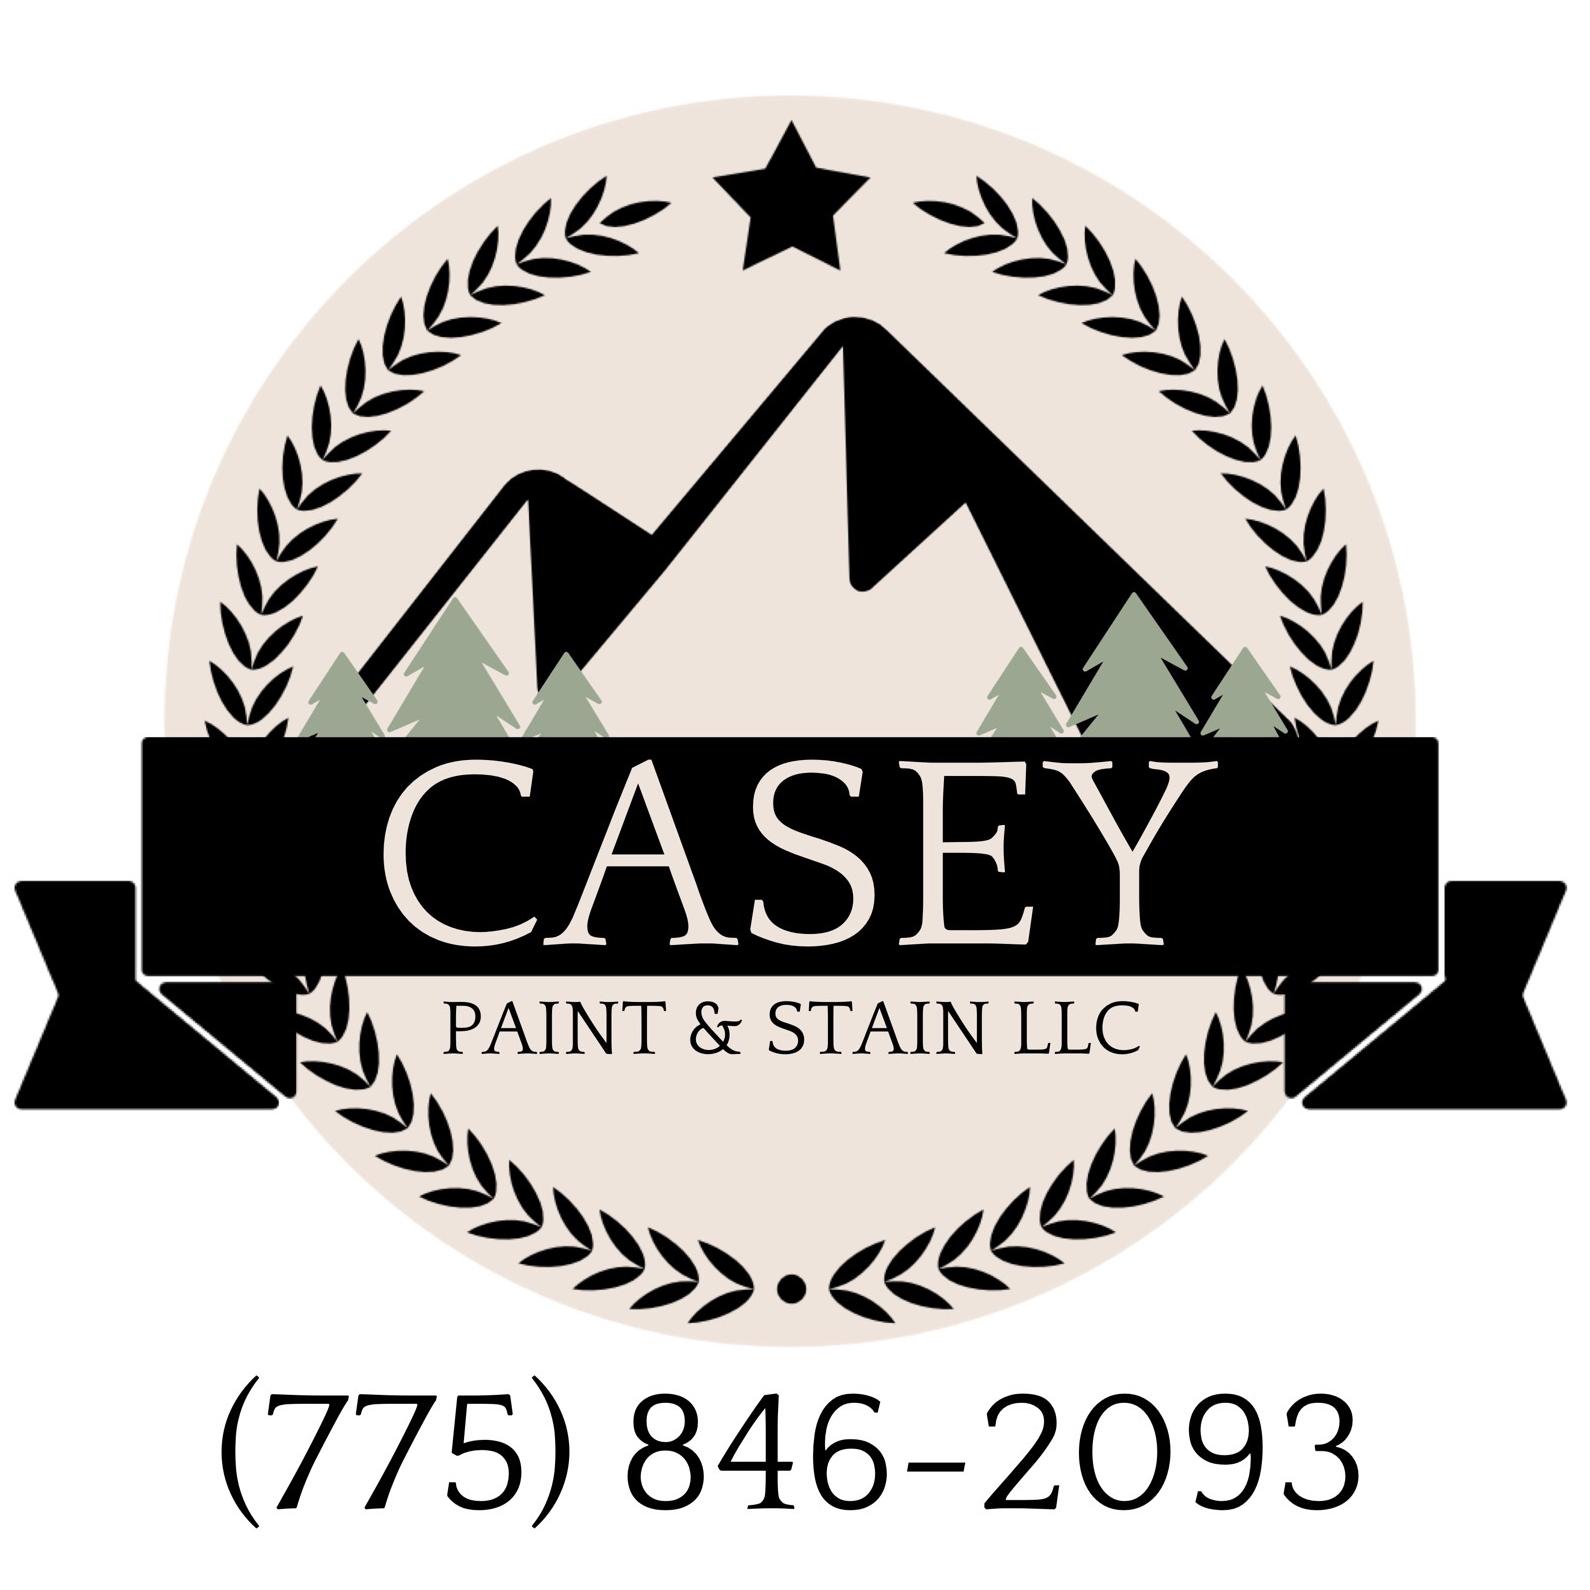 Casey Paint & Stain LLC